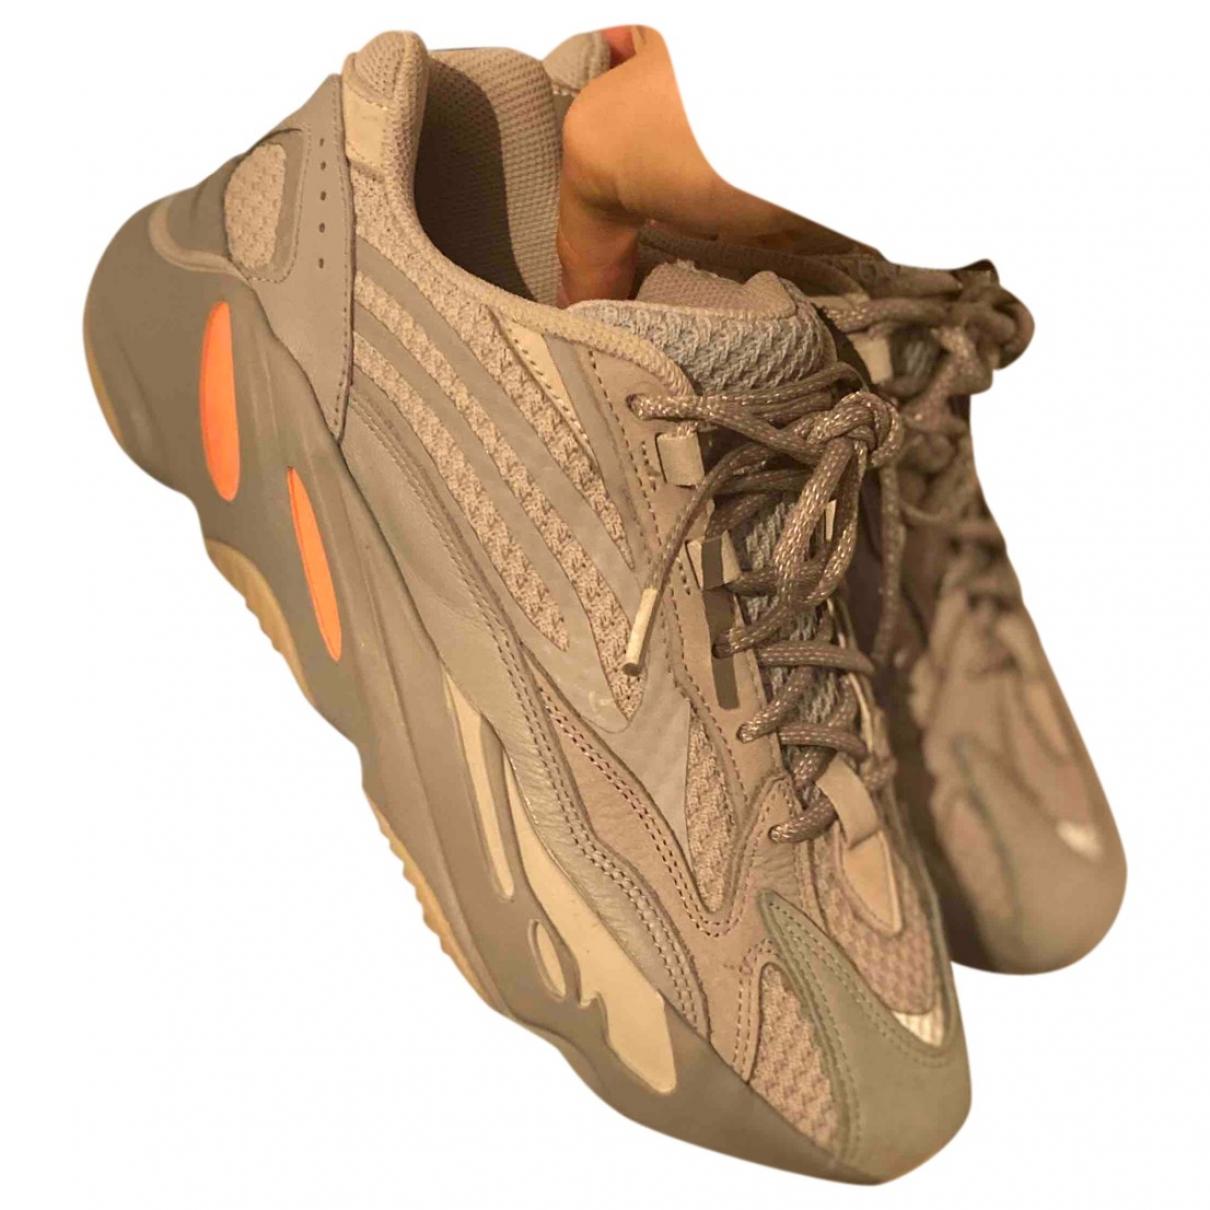 Yeezy X Adidas - Baskets Boost 700 V2 pour homme en suede - gris